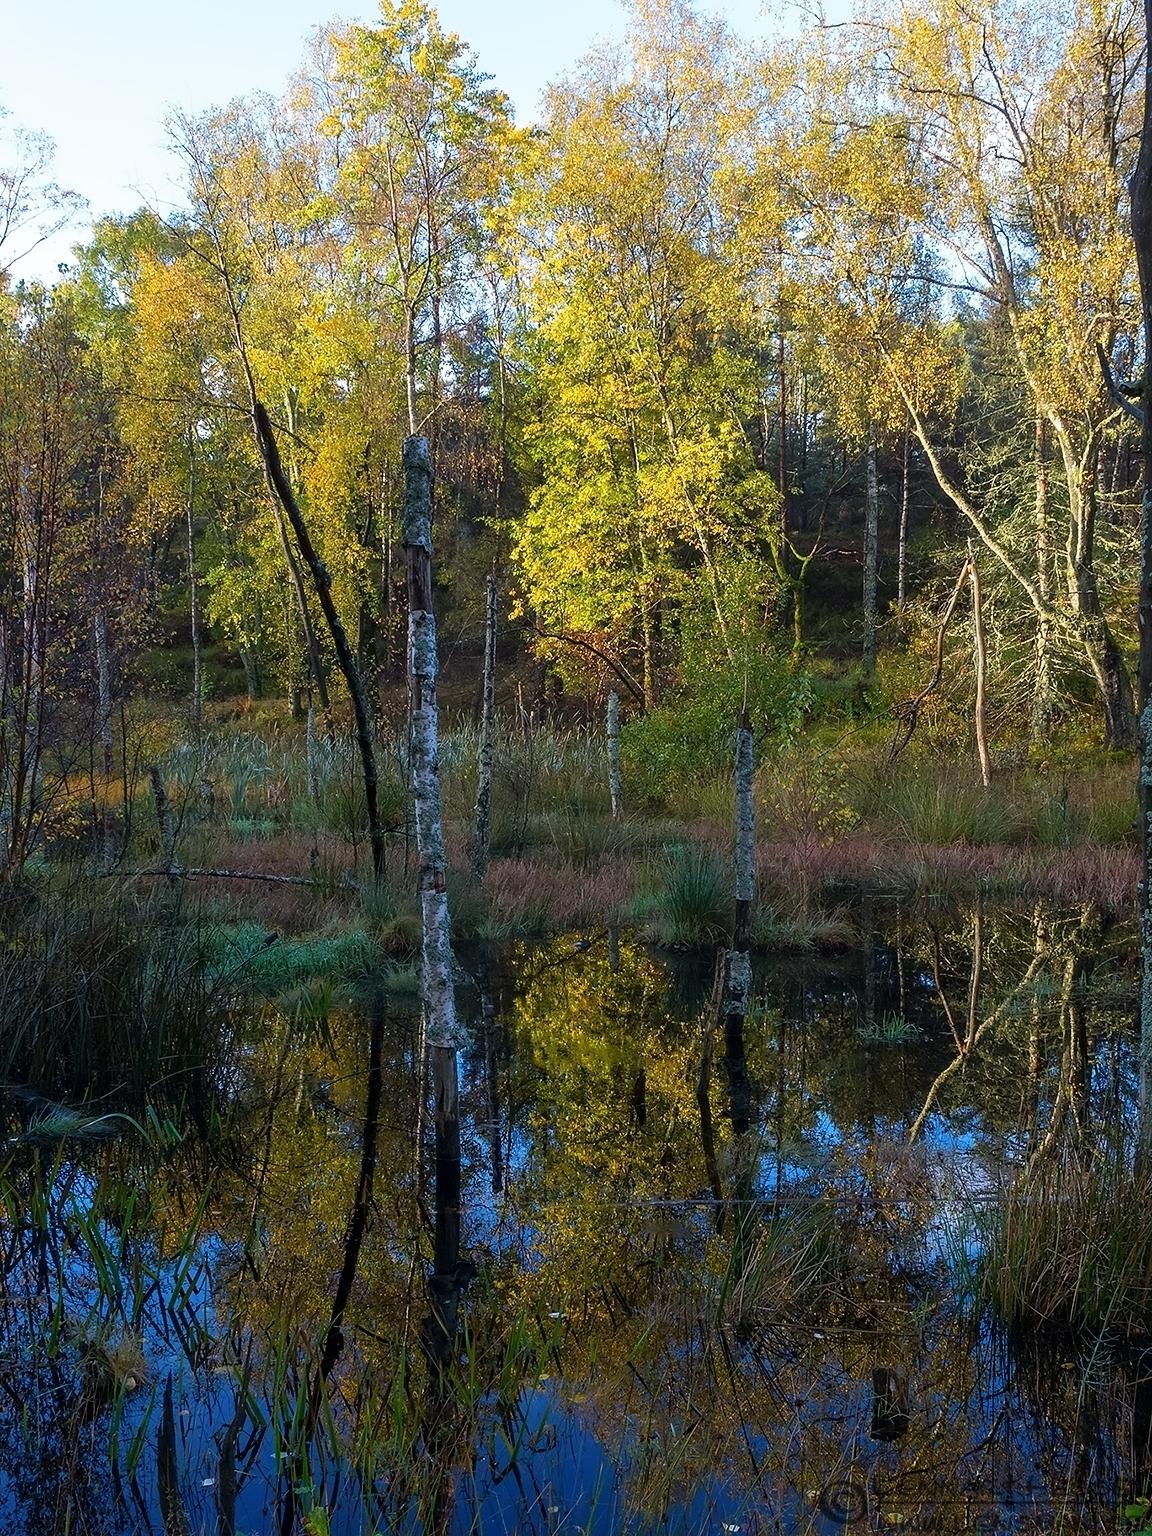 The pond along the road to Brudarebacken, Gothenburg